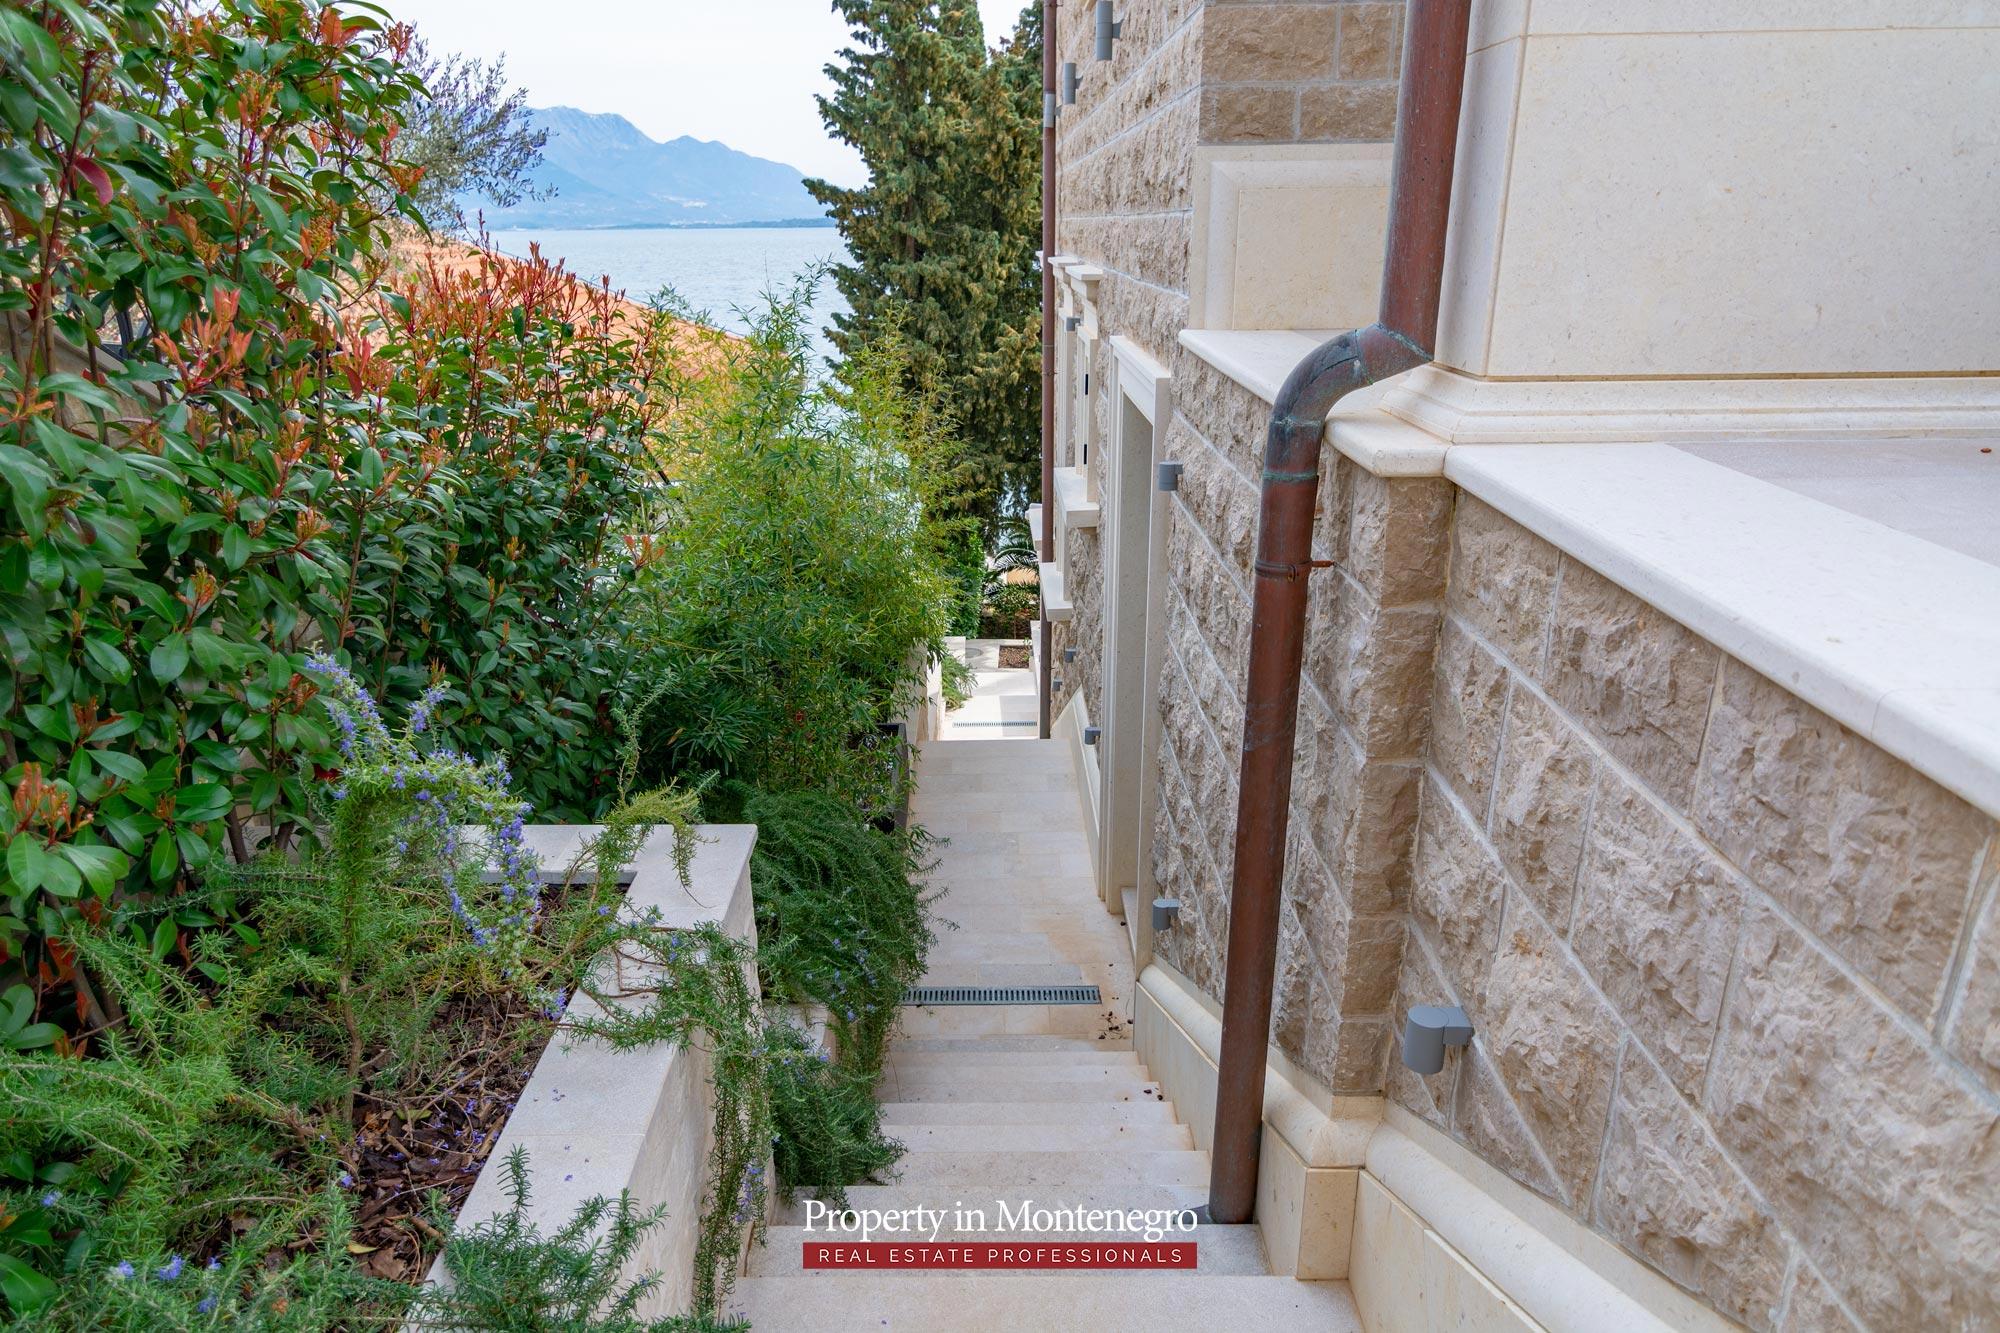 Luxury-waterfront-villa-for-sale-in-Montenegro (42).jpg